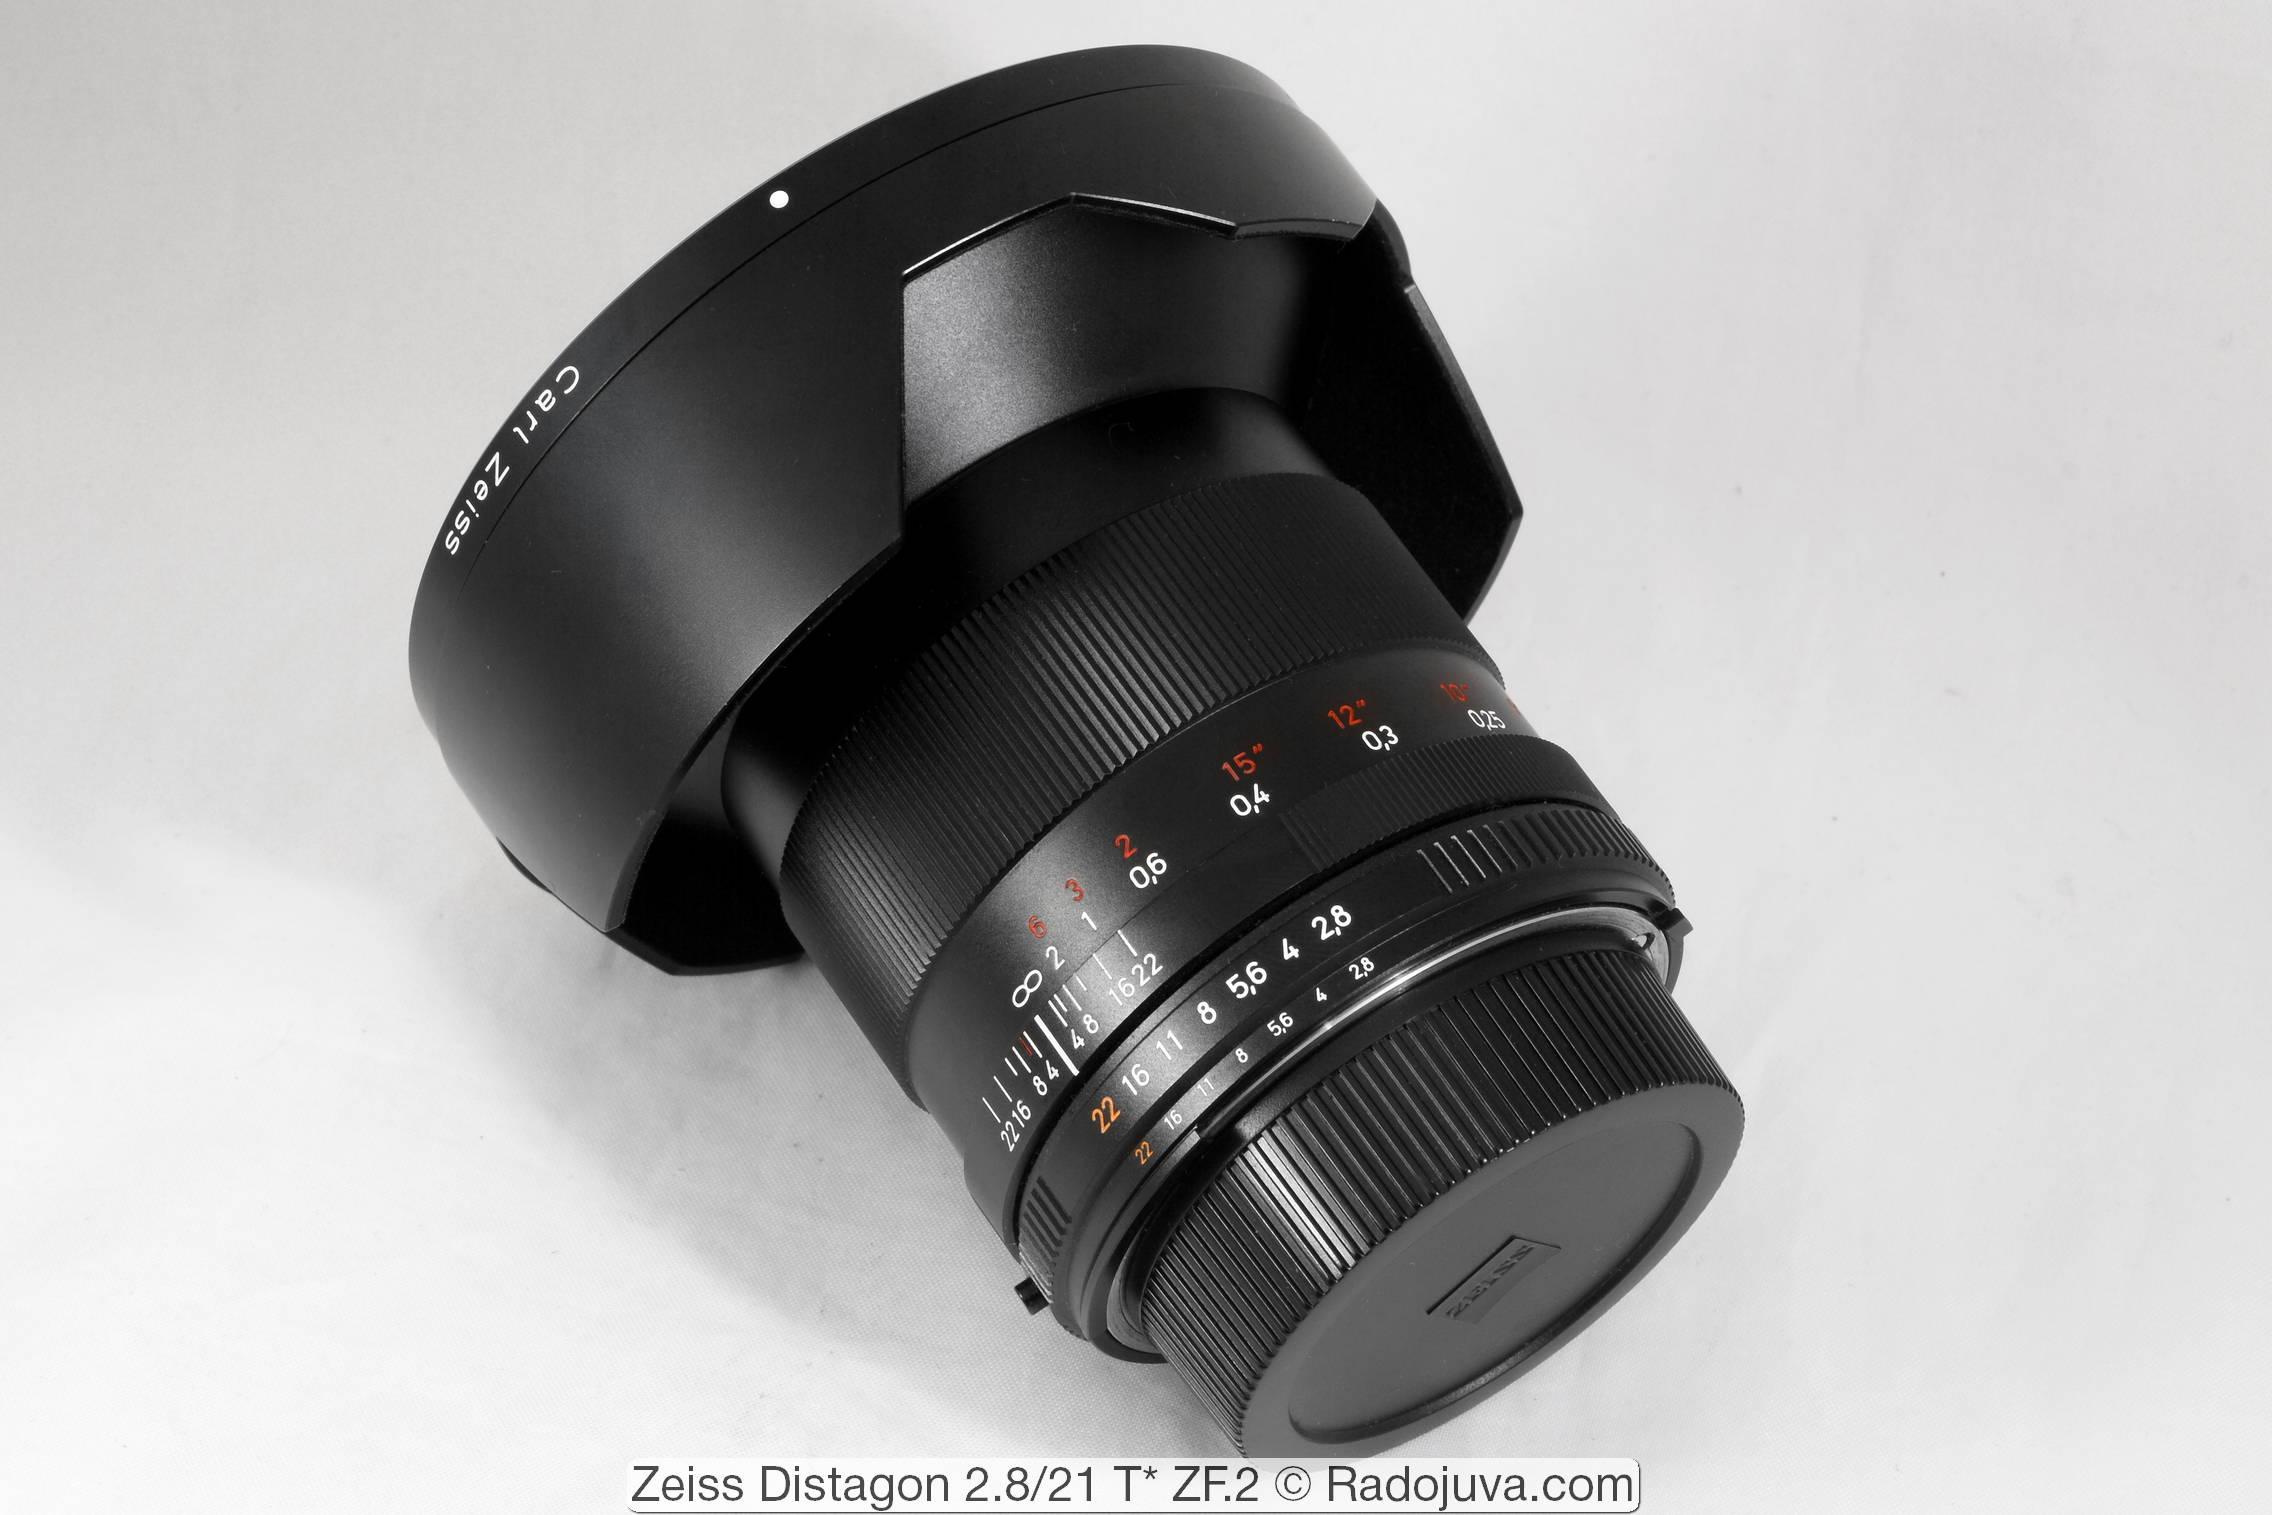 Carl Zeiss Distagon 2.8 / 21 T * ZF.2